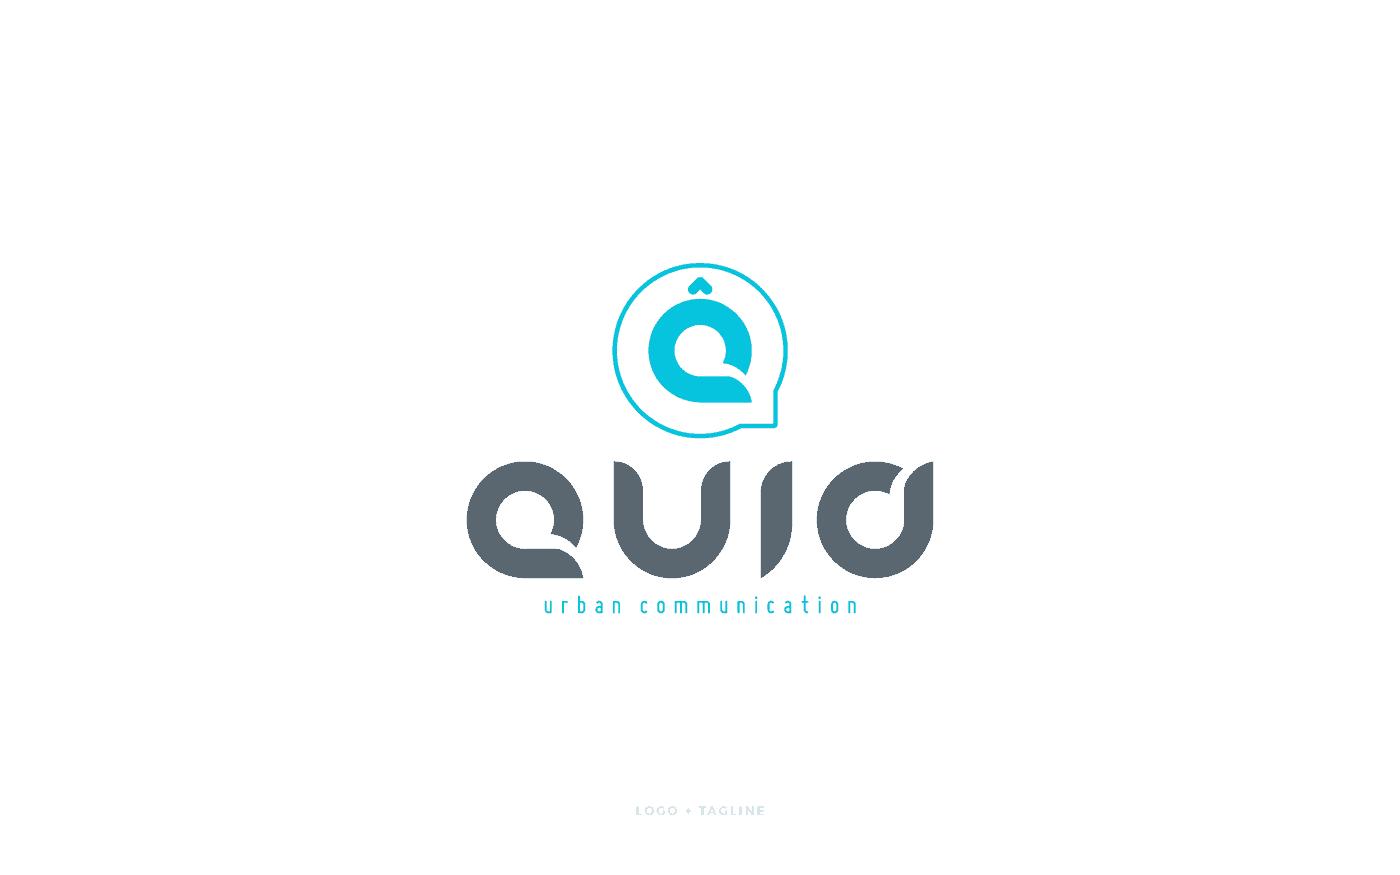 Quid Urban Communication logo tagline